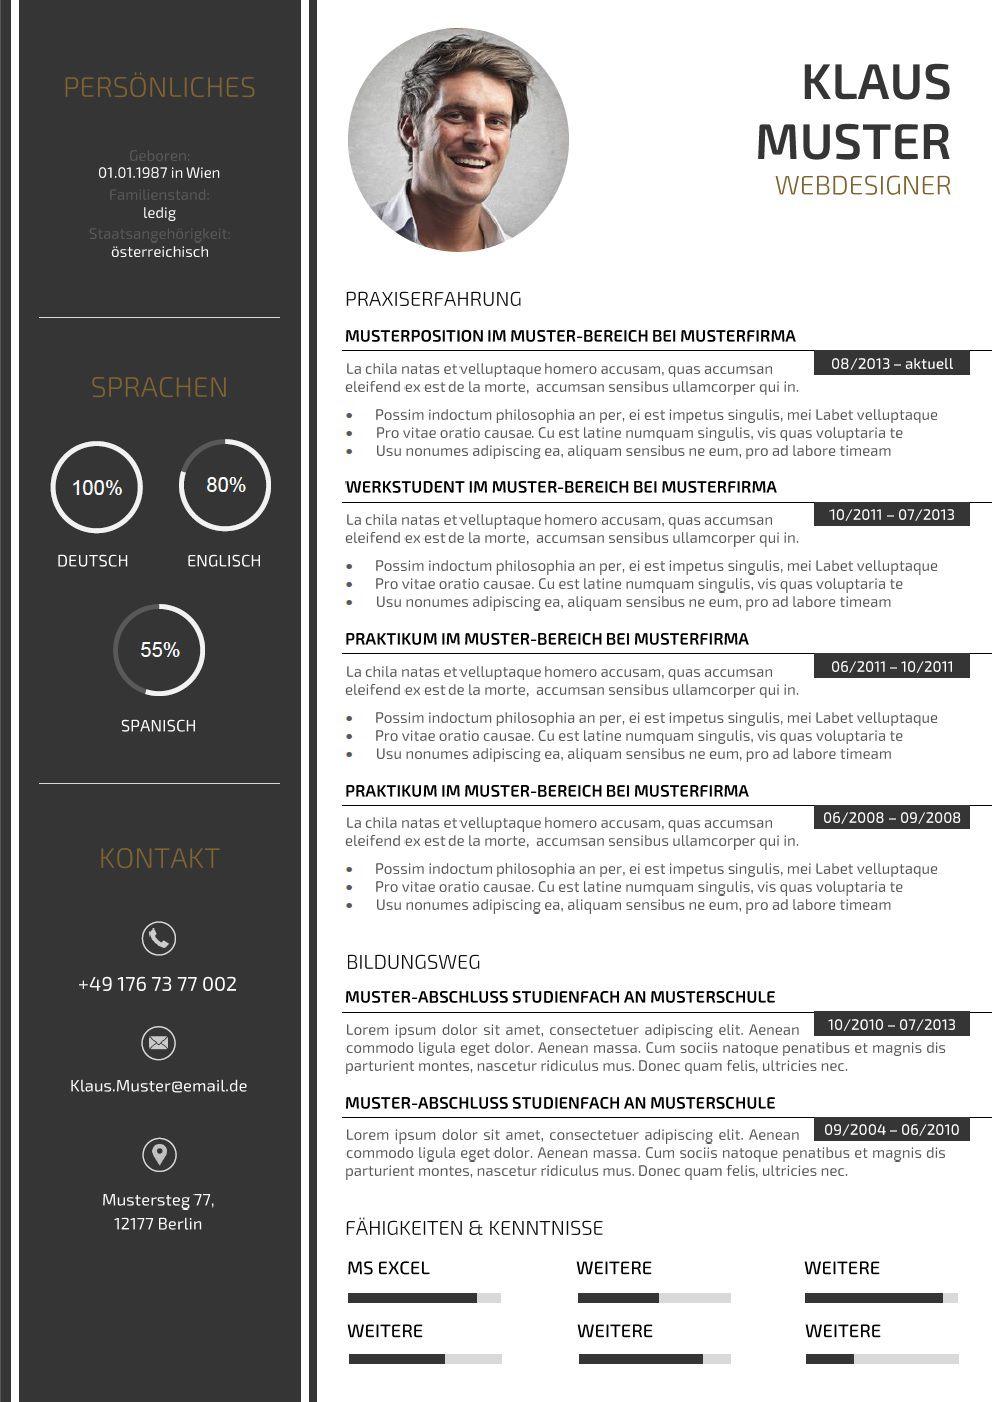 Muster Lebenslauf Word: Muster Lebenslauf Design